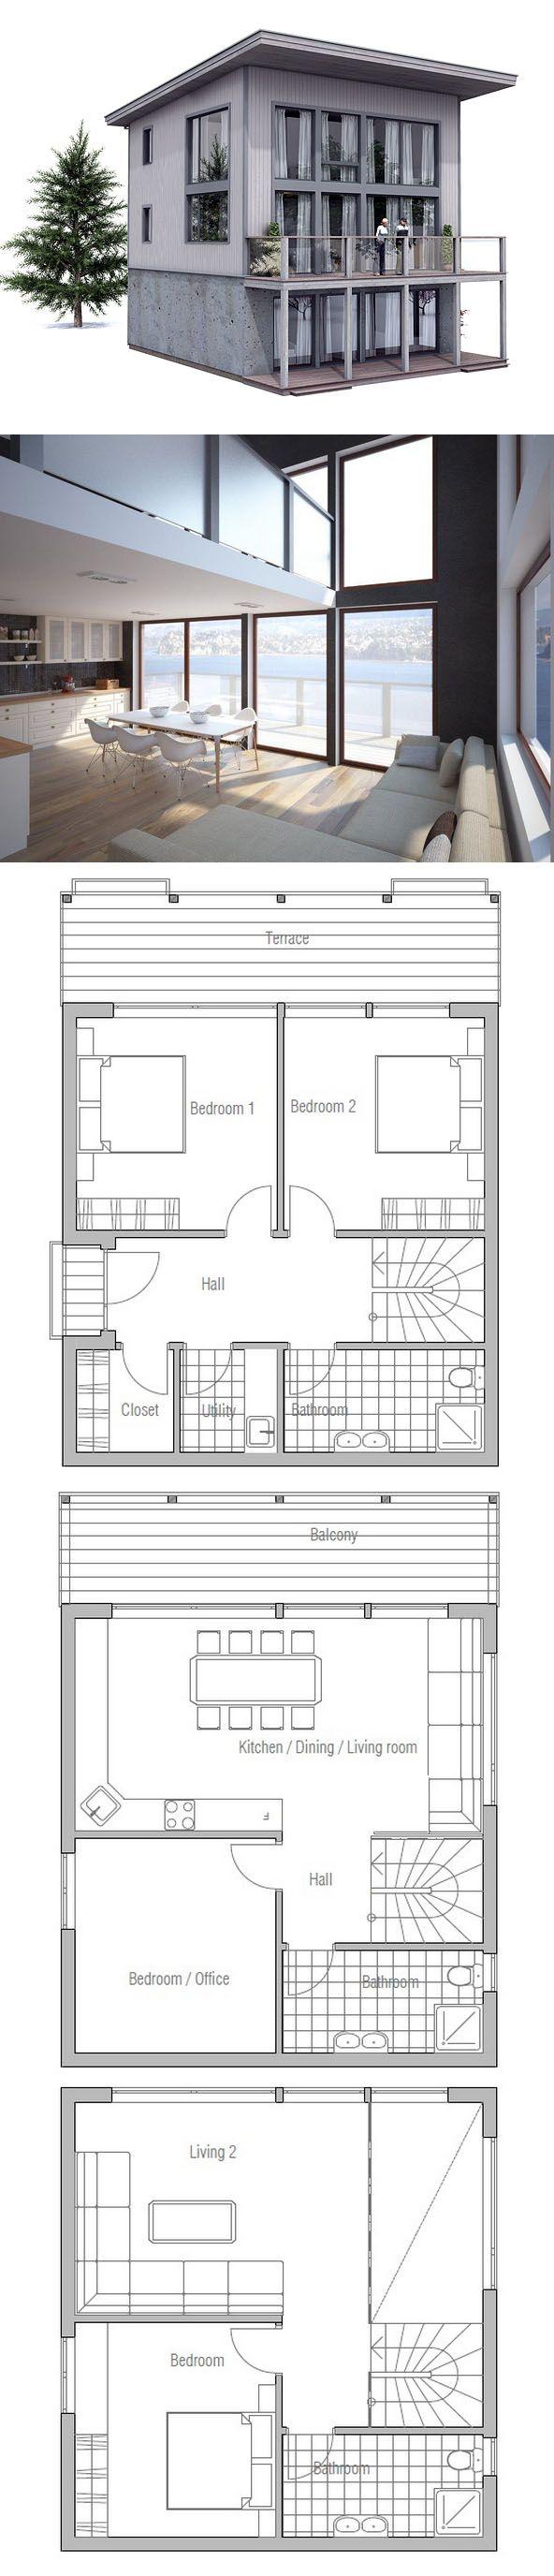 Prairie House Plan Small Cottage Plan Arsitektur Denah Rumah Arsitek